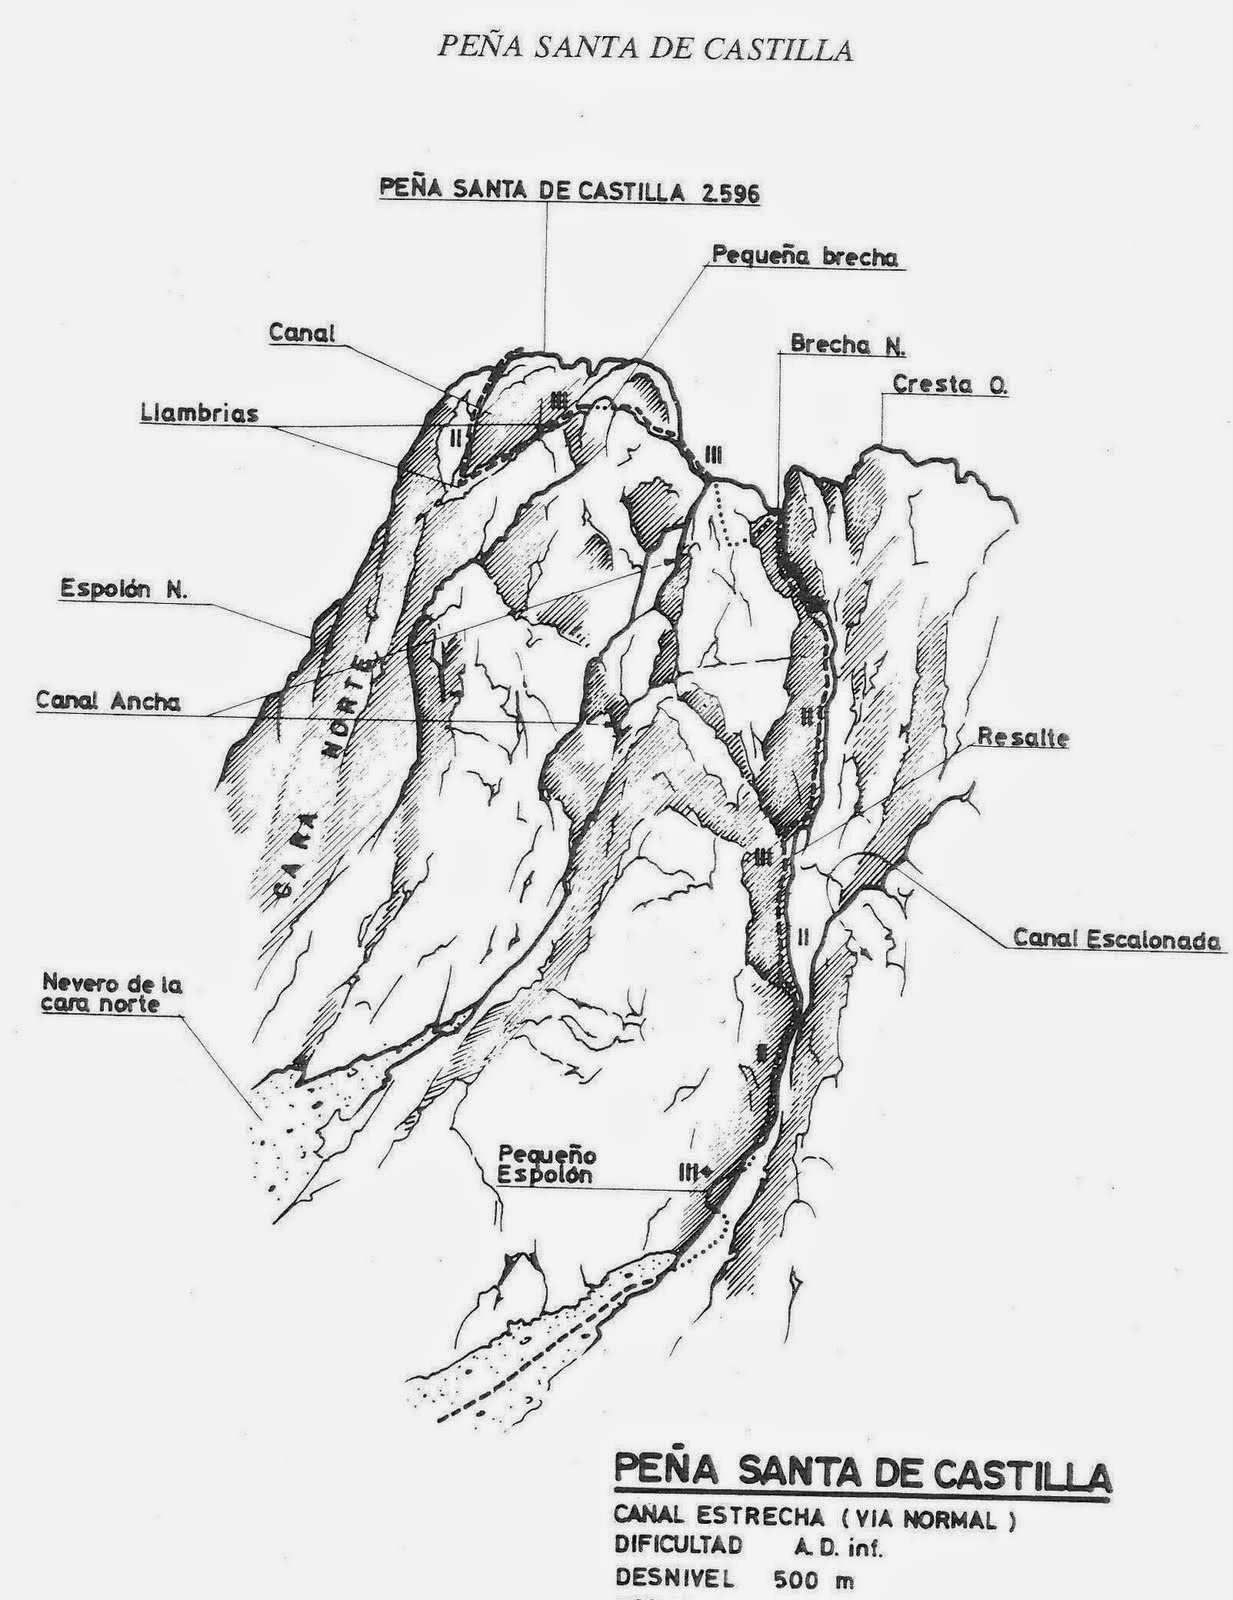 Mountaineering Pena Santa De Castilla Cestrecha